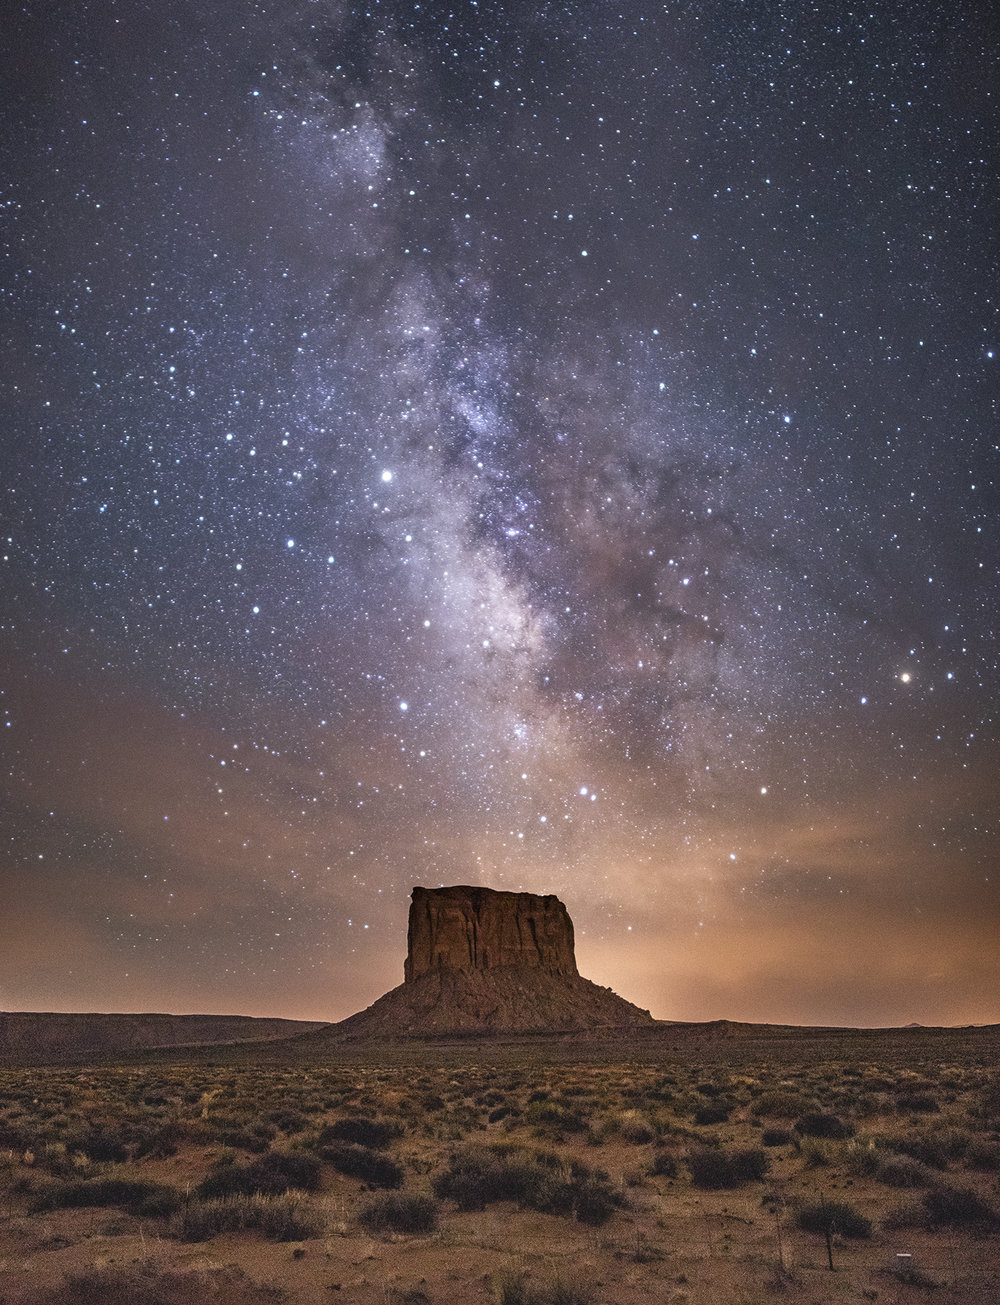 Monument Valley - Oljato Monument Valley Navajo Tribal Park // Photographer: Jason Wilson // Canon 5D Mark IV + Rokinon 24mm f/1.4 // ISO 3200, f/1.4, 20